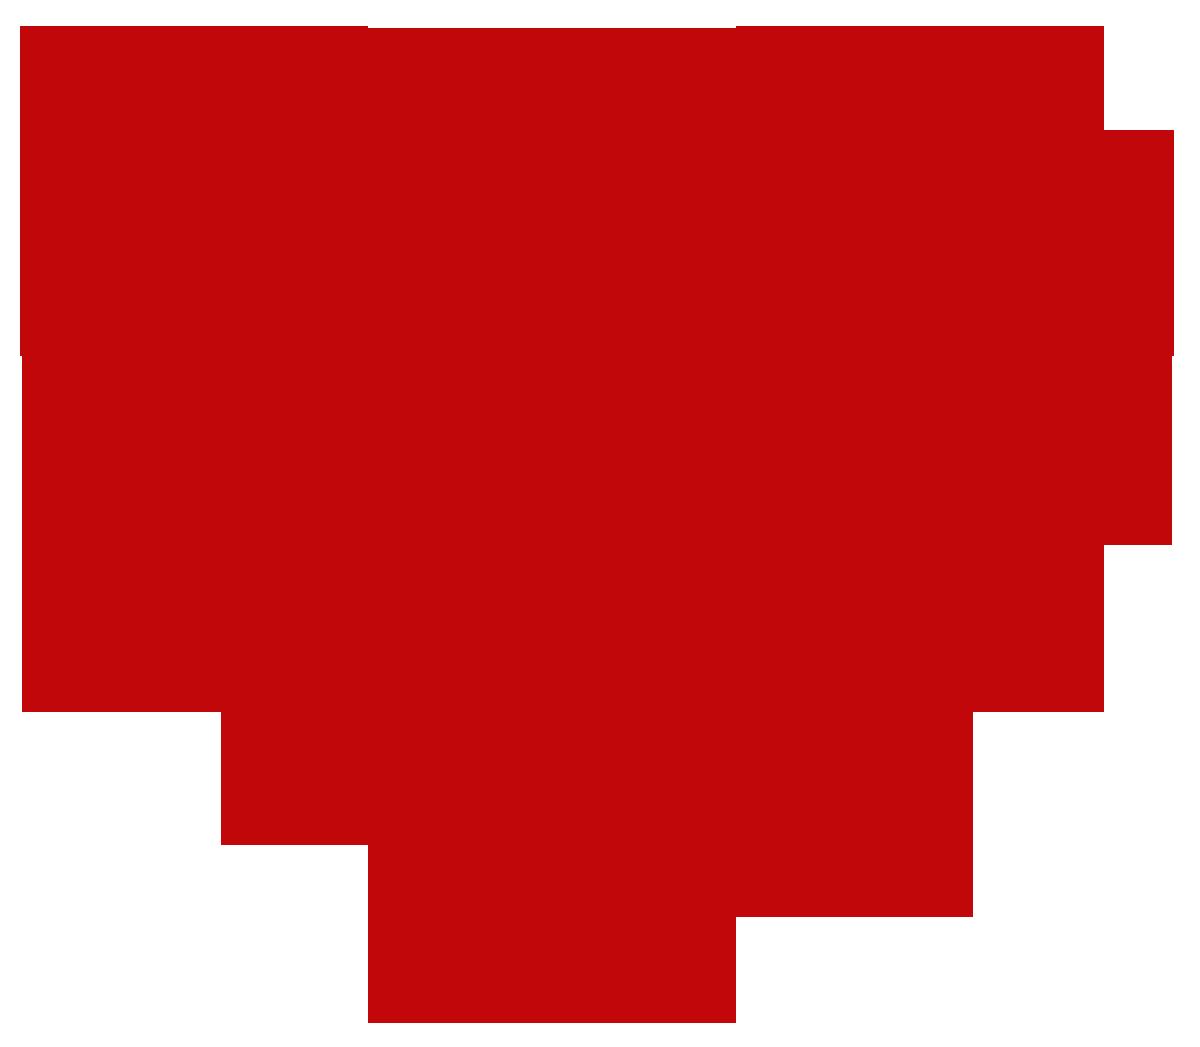 Heart shaped basketball clipart clip art free download Clip art love clipart | Clipart Panda - Free Clipart Images clip art free download